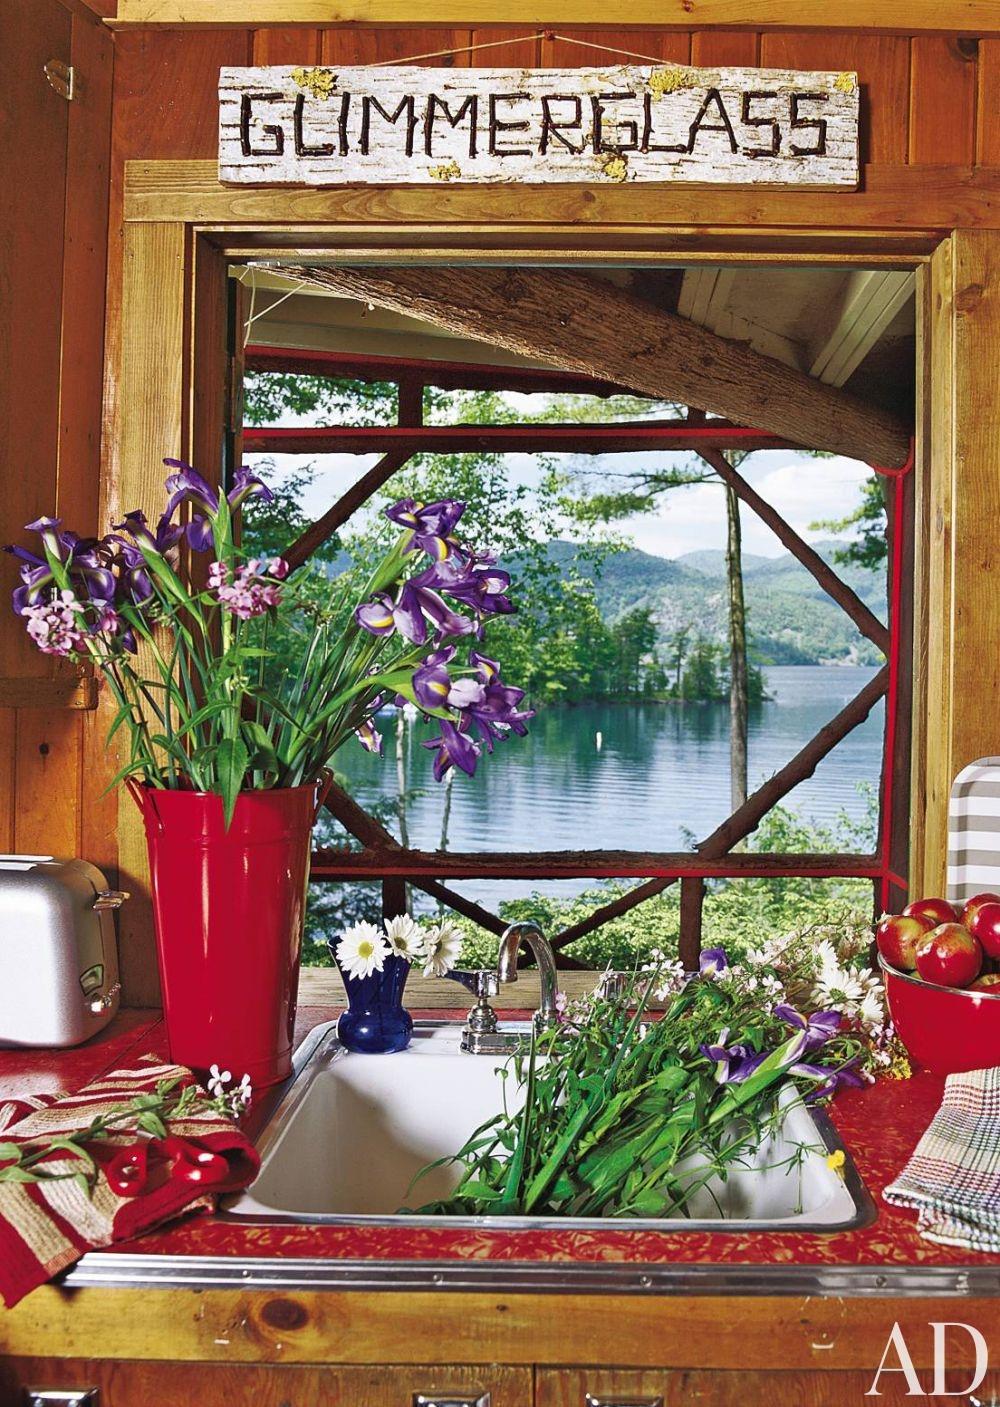 rustic-kitchen-francisco-ruiz-new-york-200506_1000-watermarked